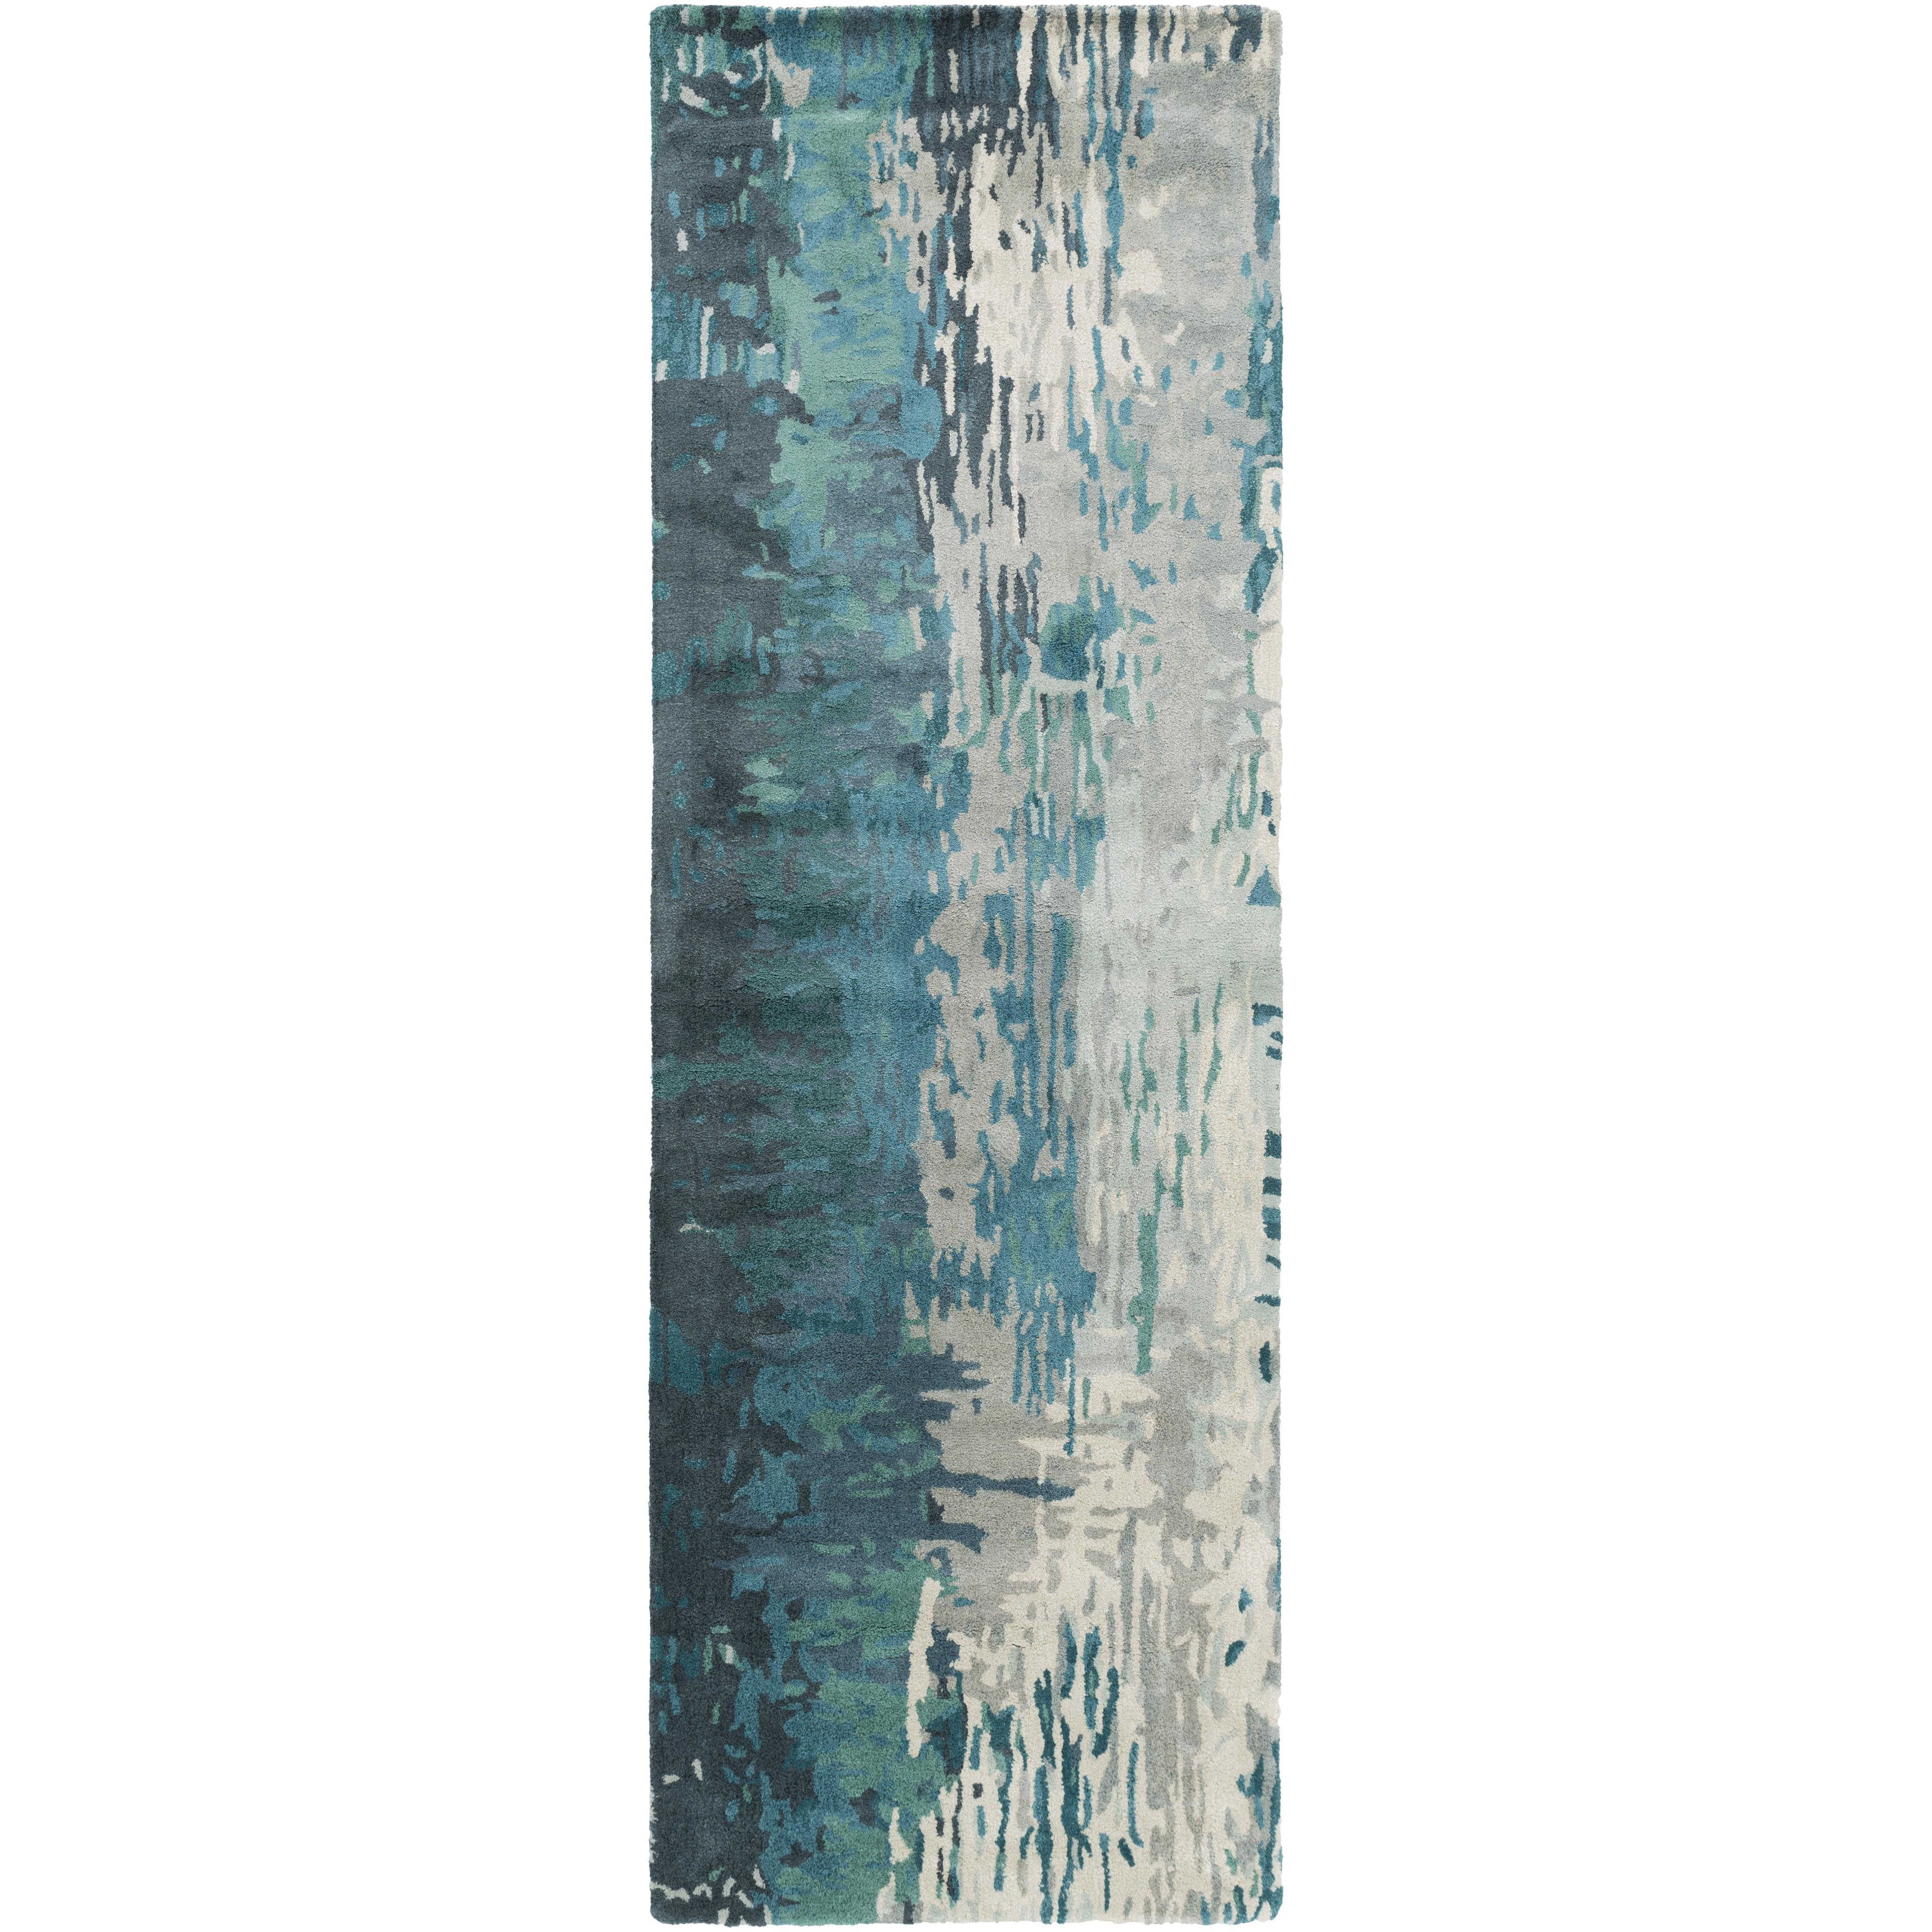 "Banshee 2'6"" x 8' by 9596 at Becker Furniture"